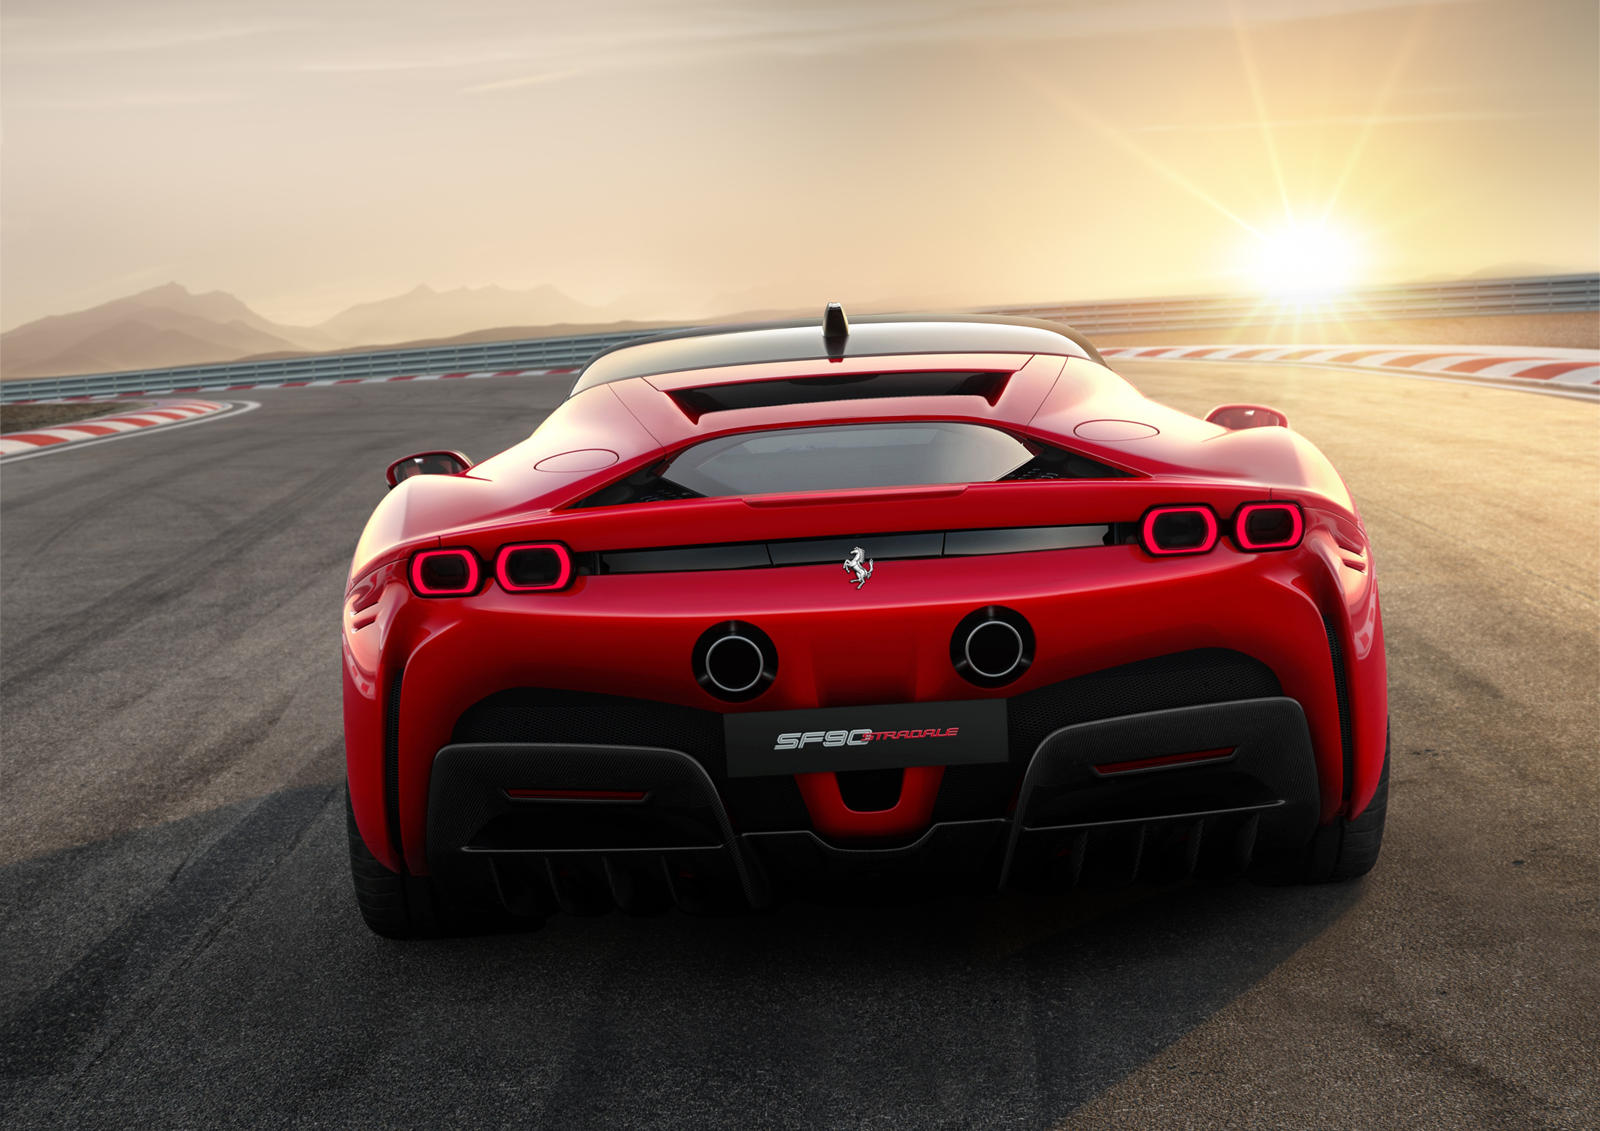 Ferrari Sf90 Stradale 1 000 Cv 04